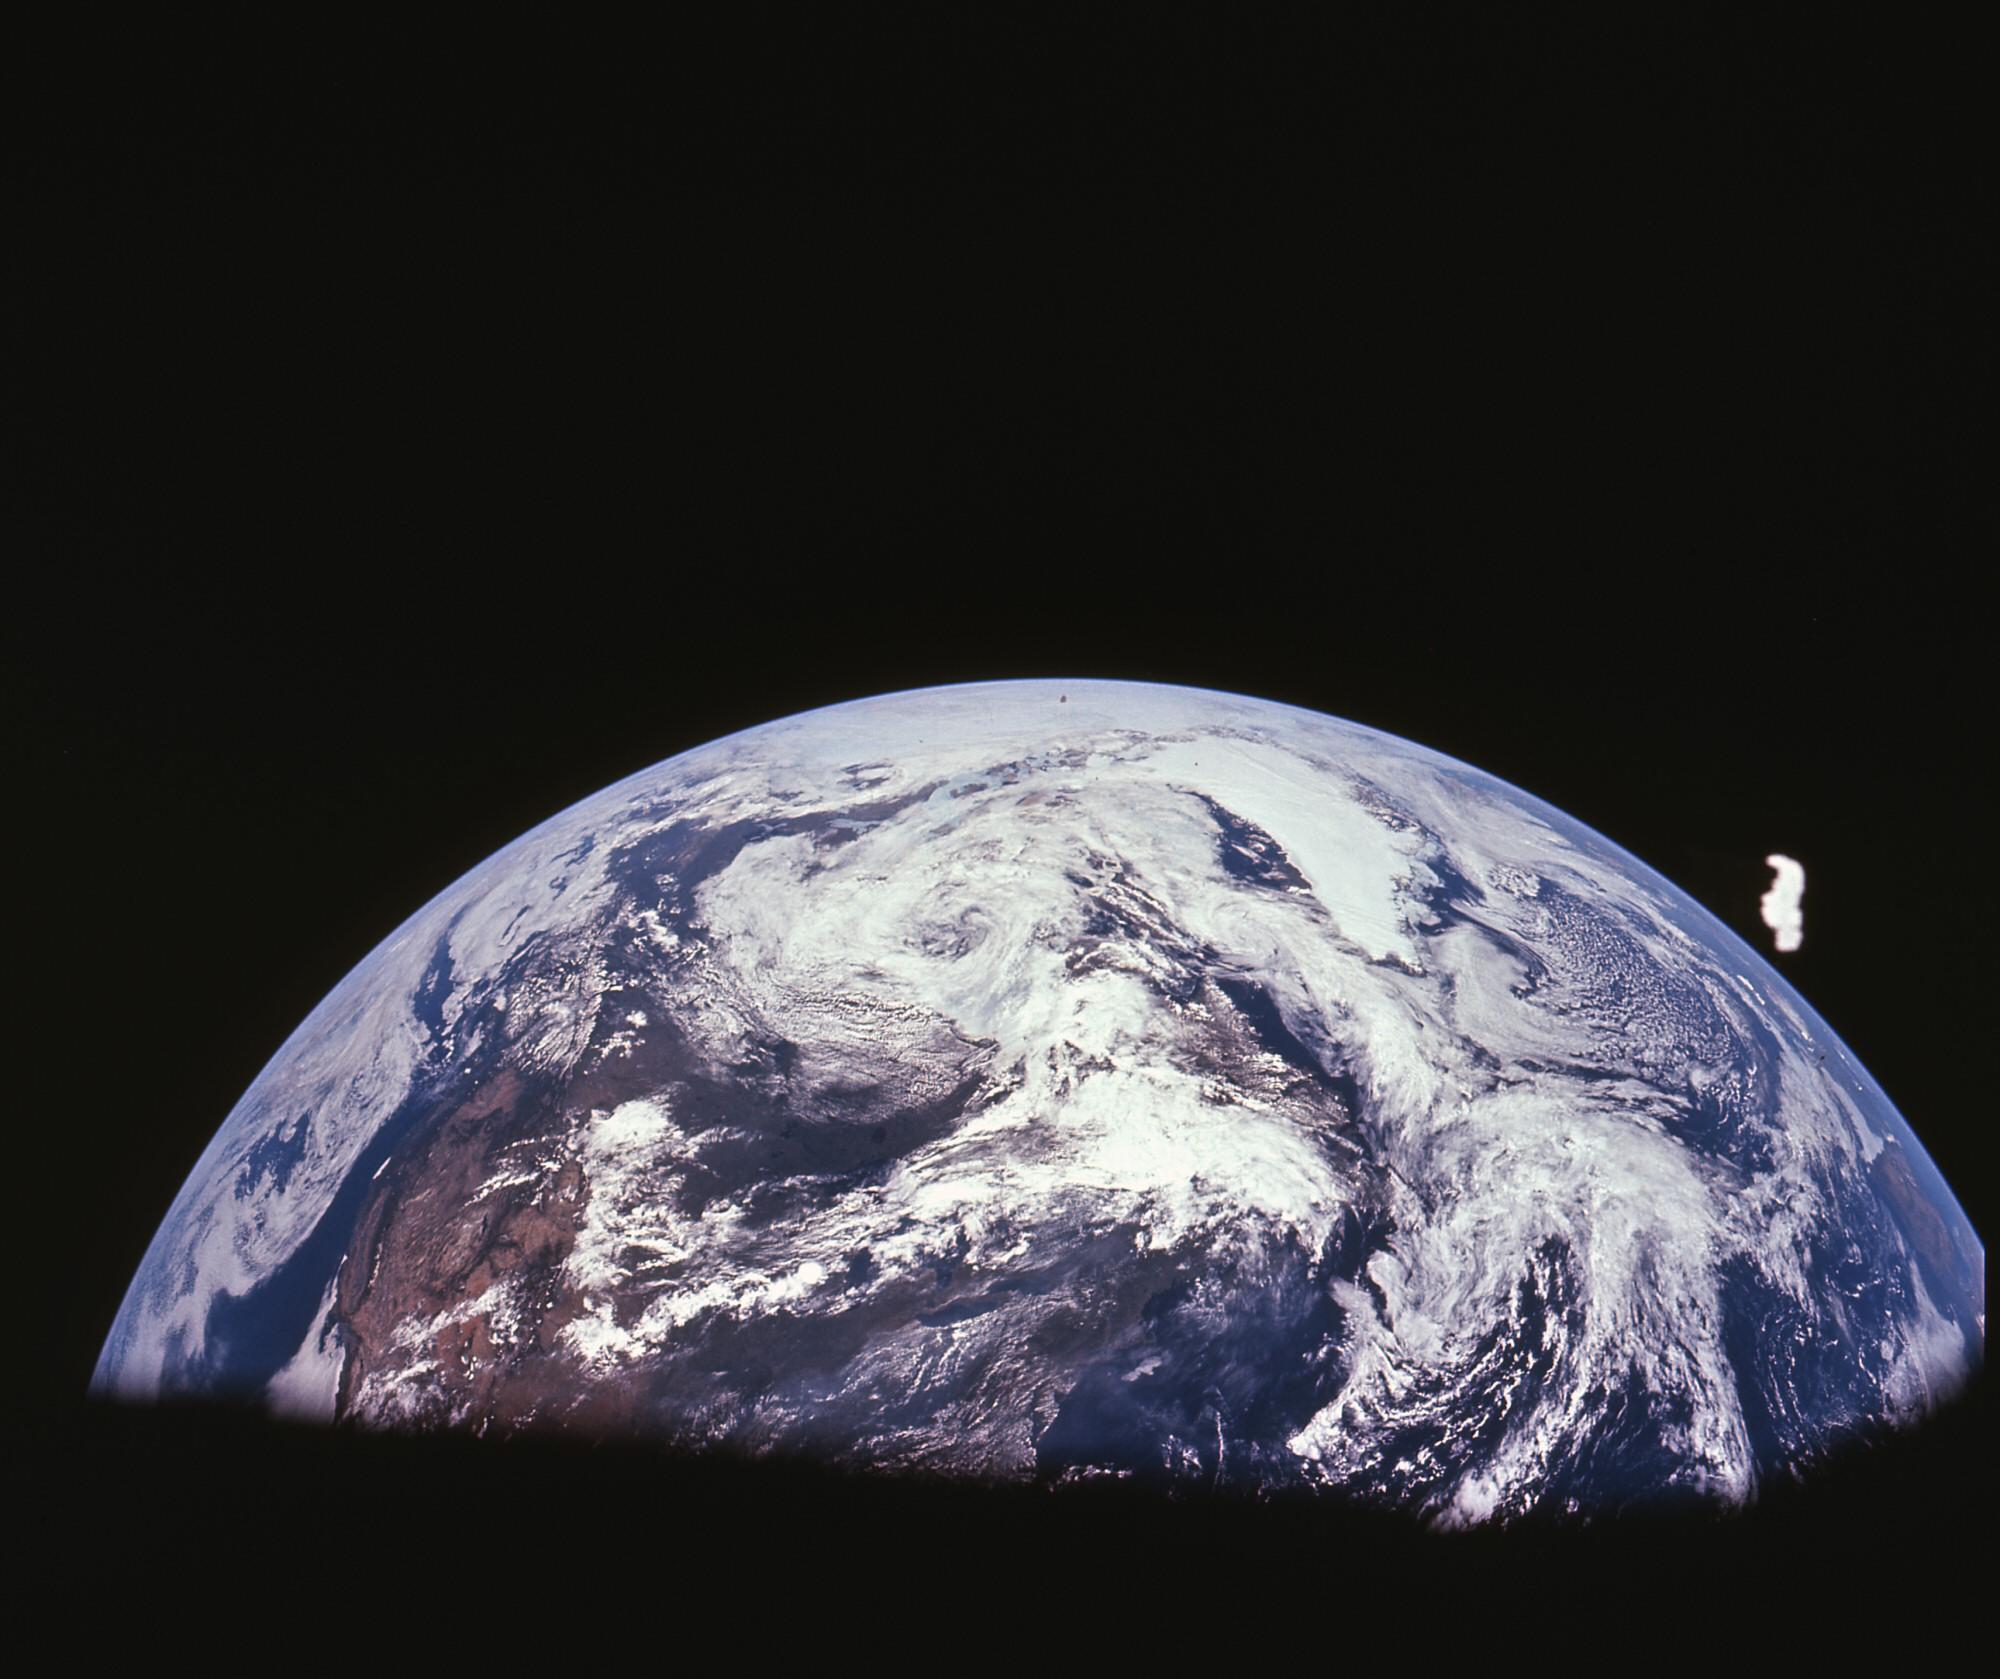 Evidence NASA Edits Photos To Keep Public In Dark ...